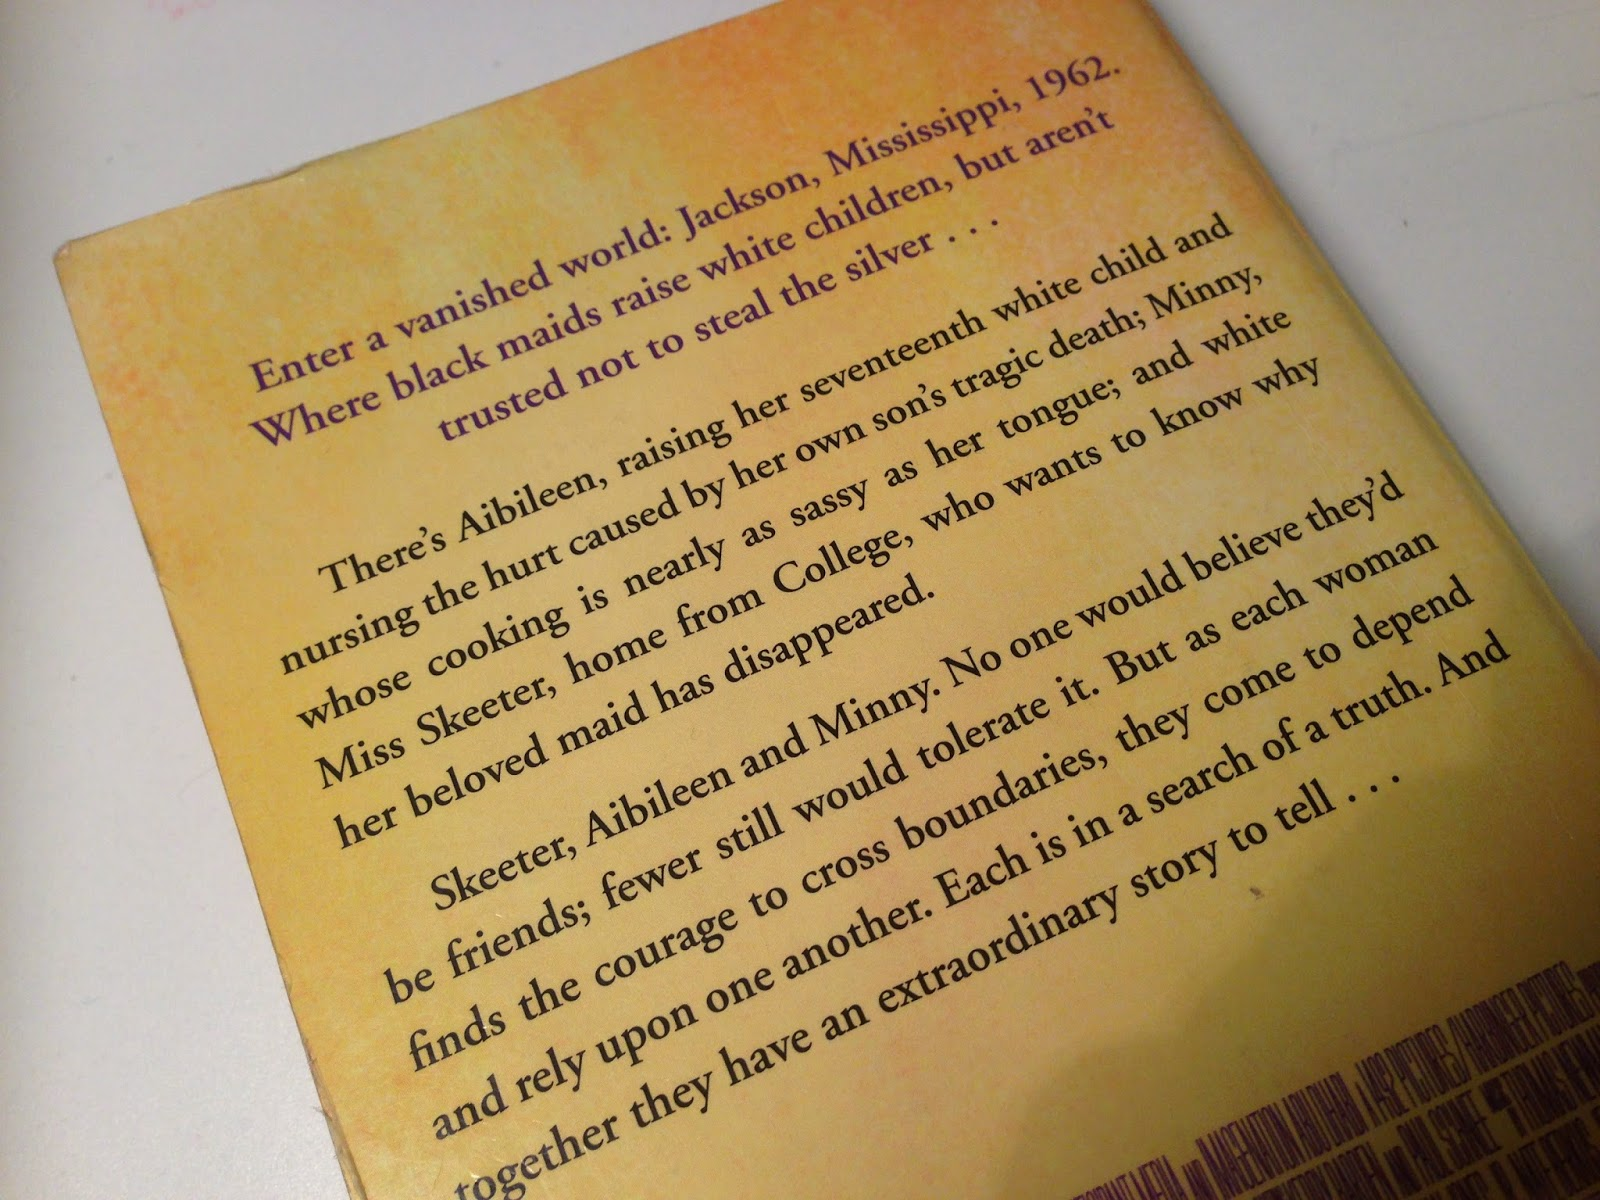 The Help By Kathryn Stockett  Tyras Bookshelf I Recently Bought The Help By Kathryn Stockett And I Devoured It In What  Felt Like Seconds